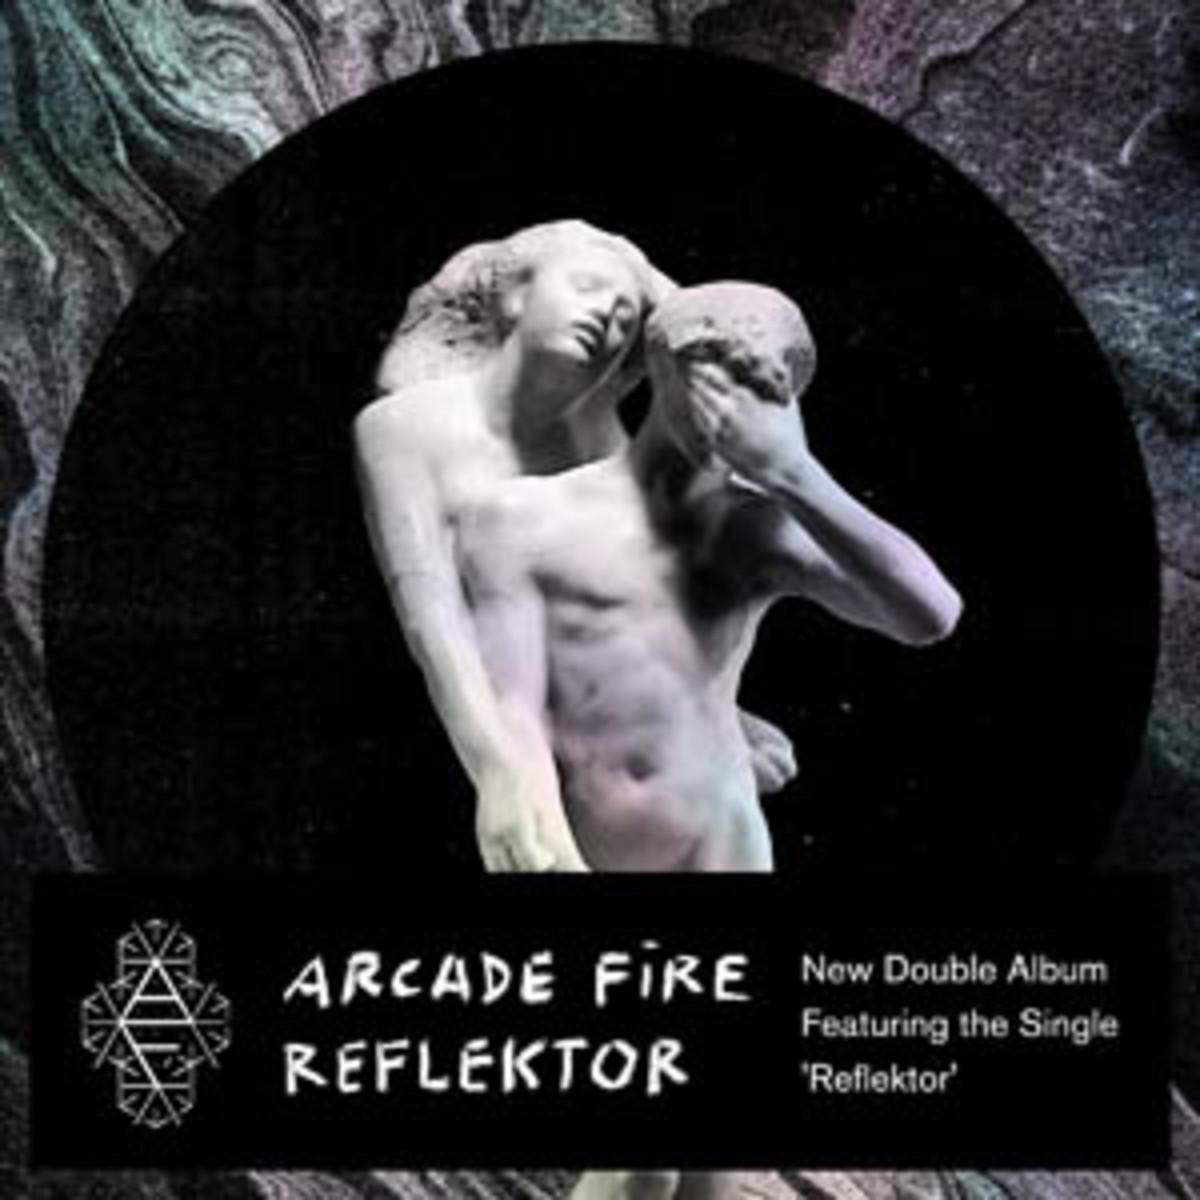 Arcade Fire Reflektor